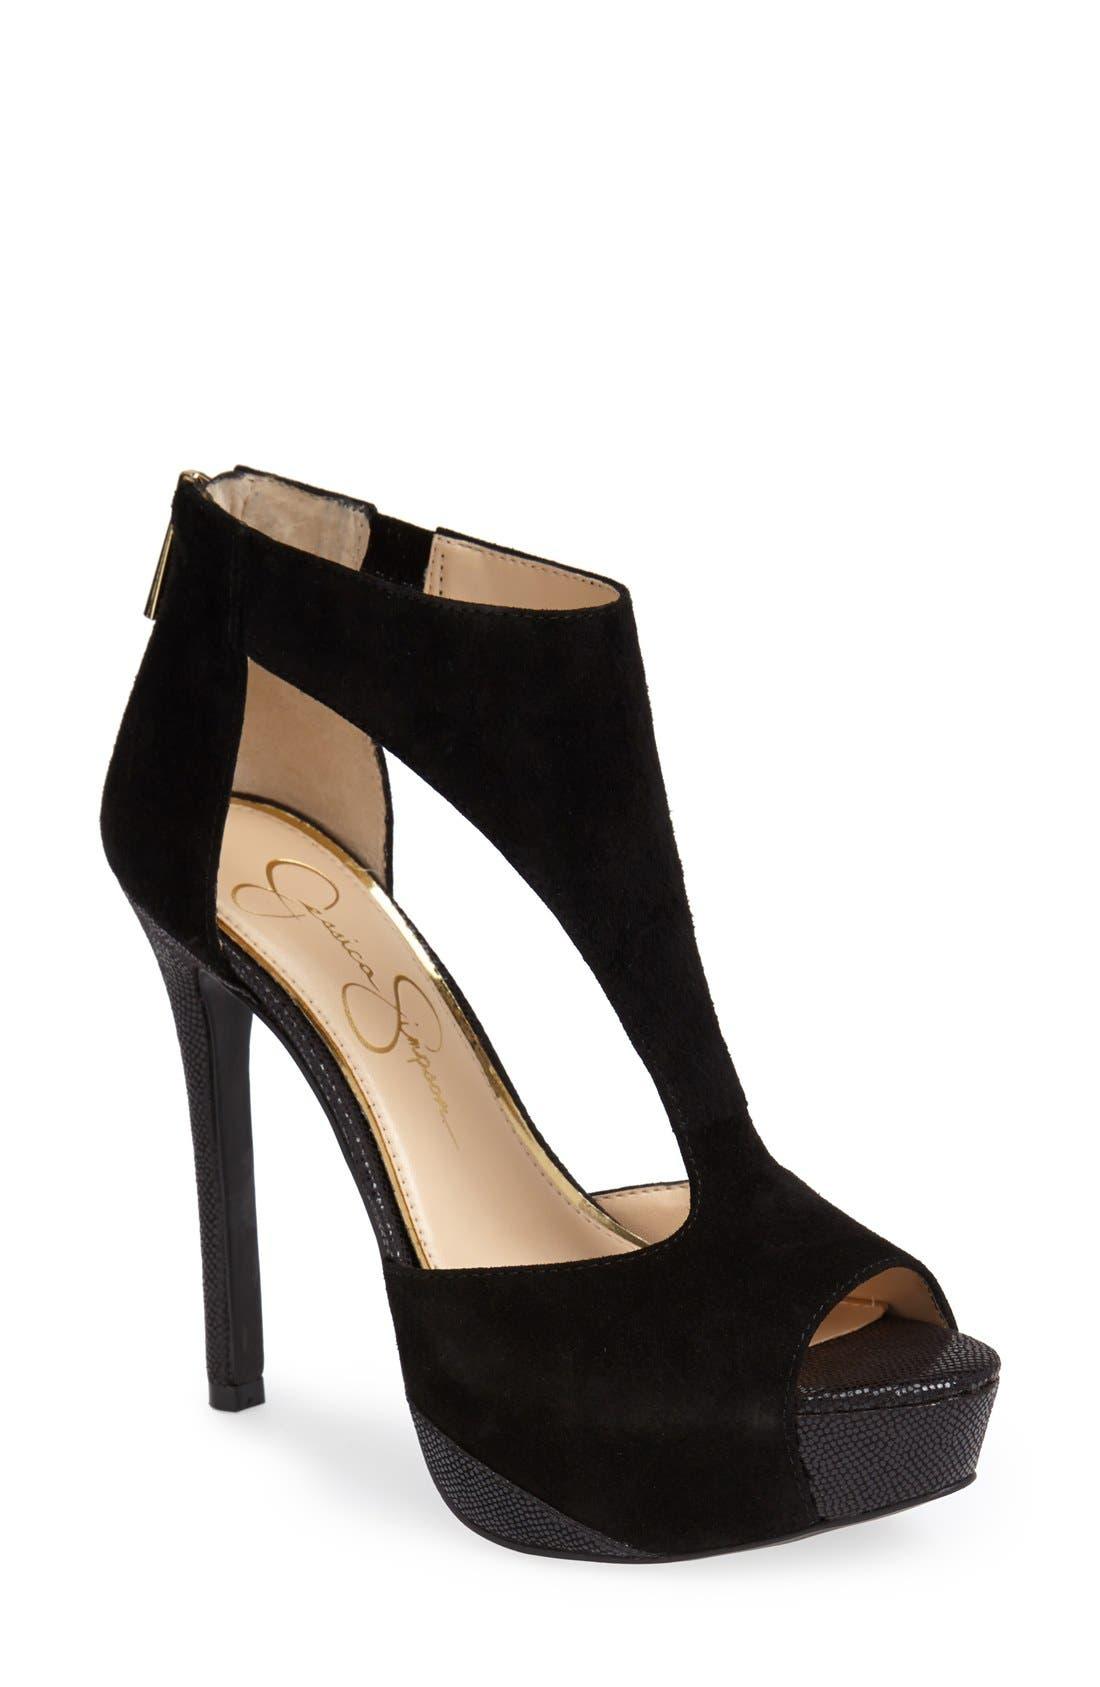 Alternate Image 1 Selected - Jessica Simpson 'Carideo' Platform Sandal (Women)